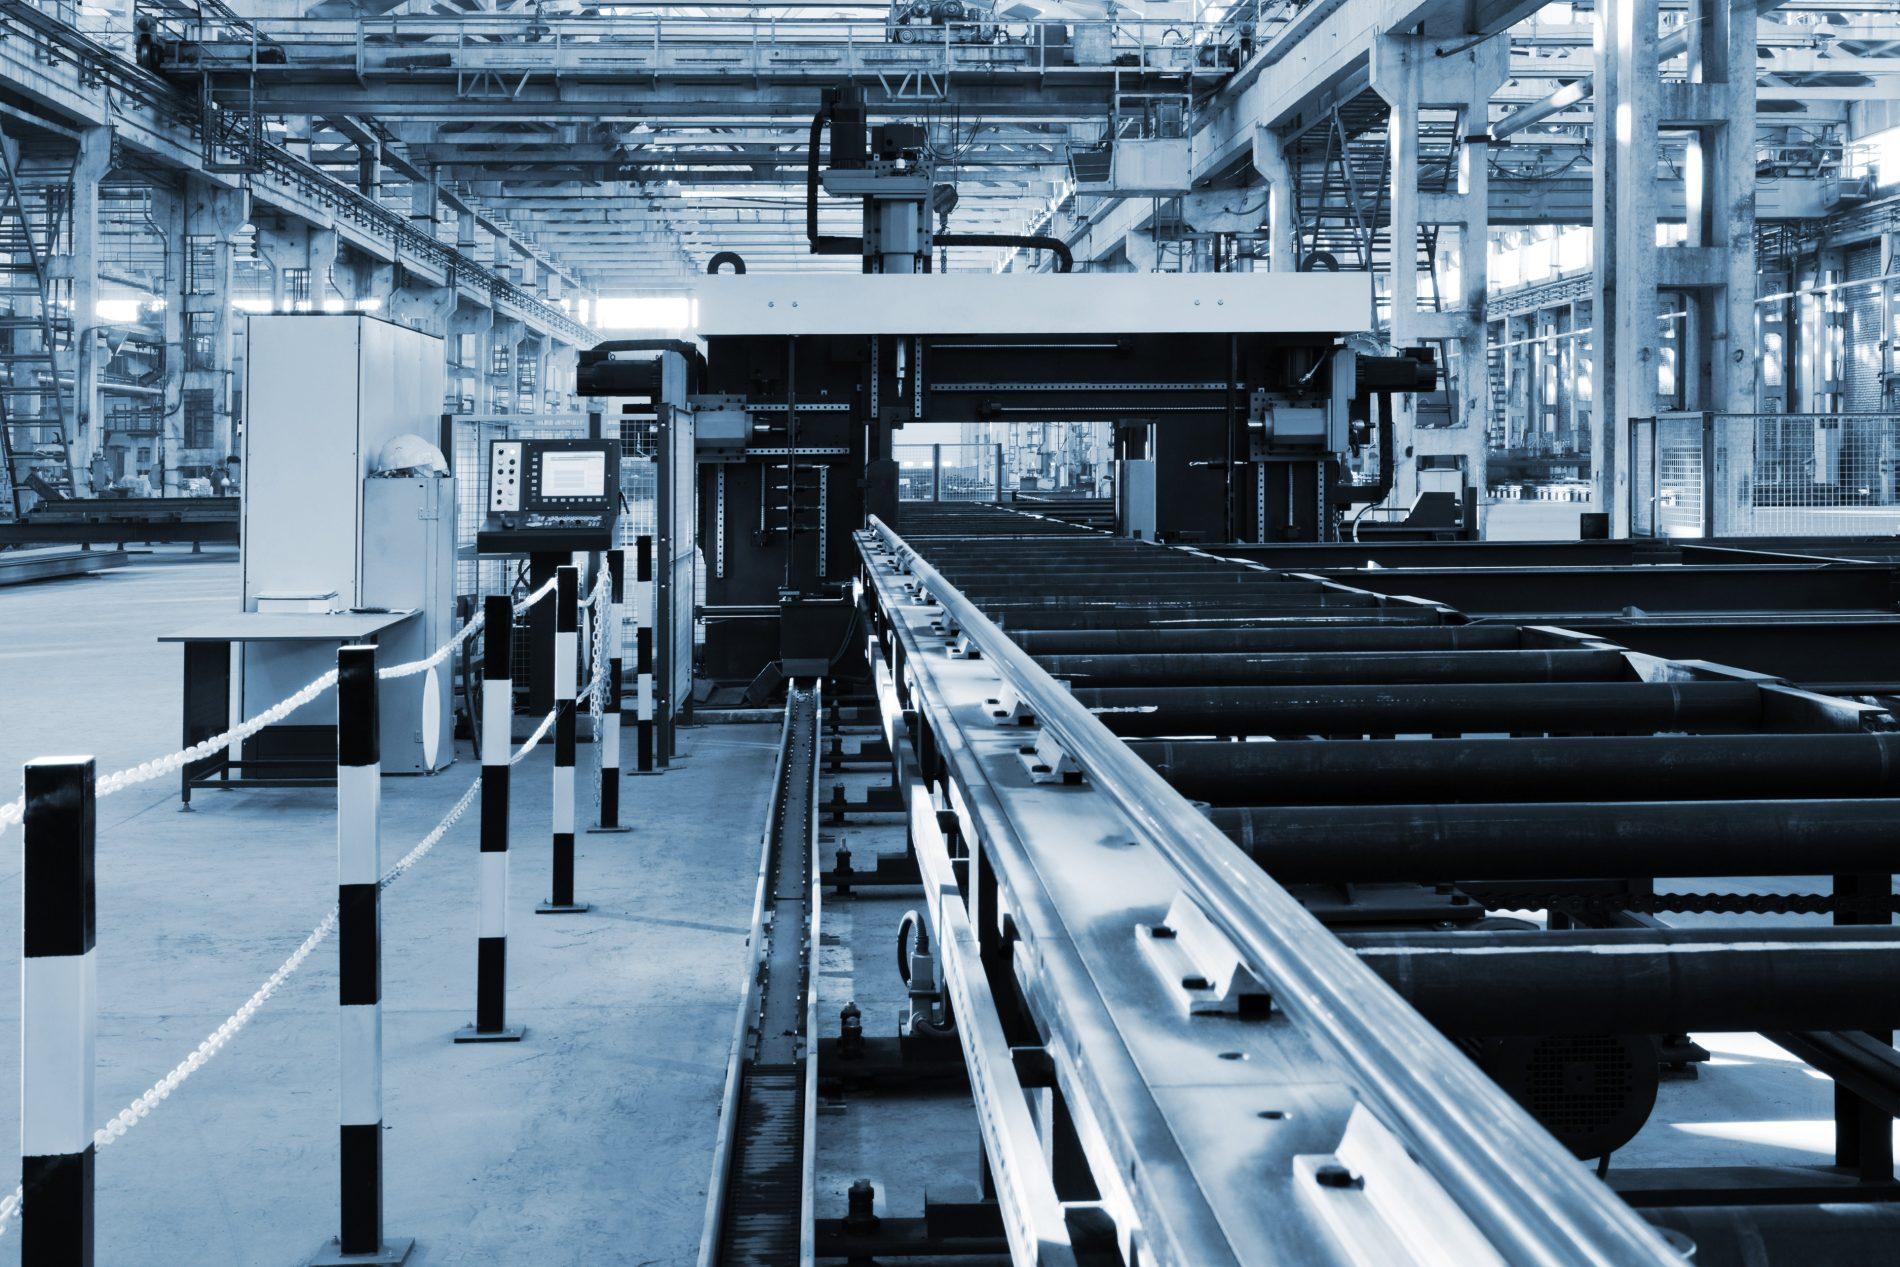 Pillen Group Lineaire Industrie Transport